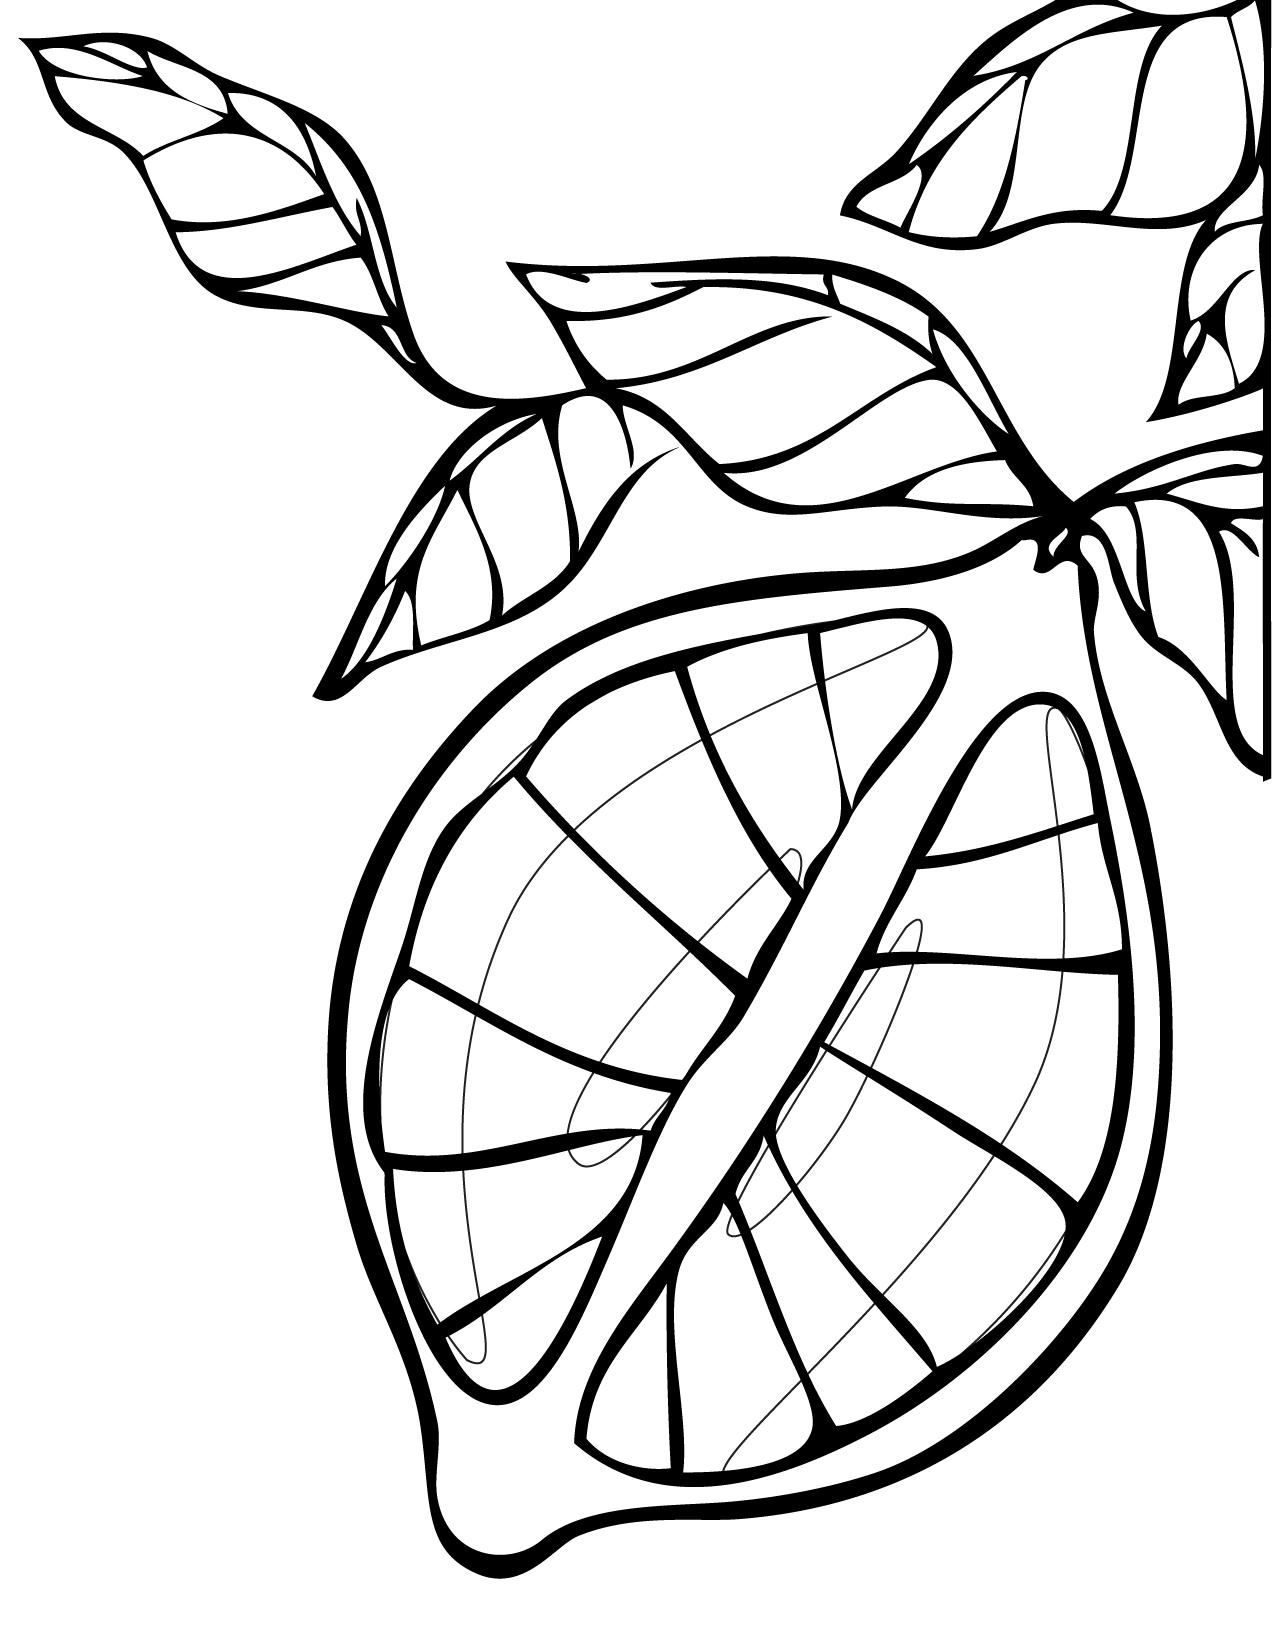 1275x1650 Lemon Coloring Page